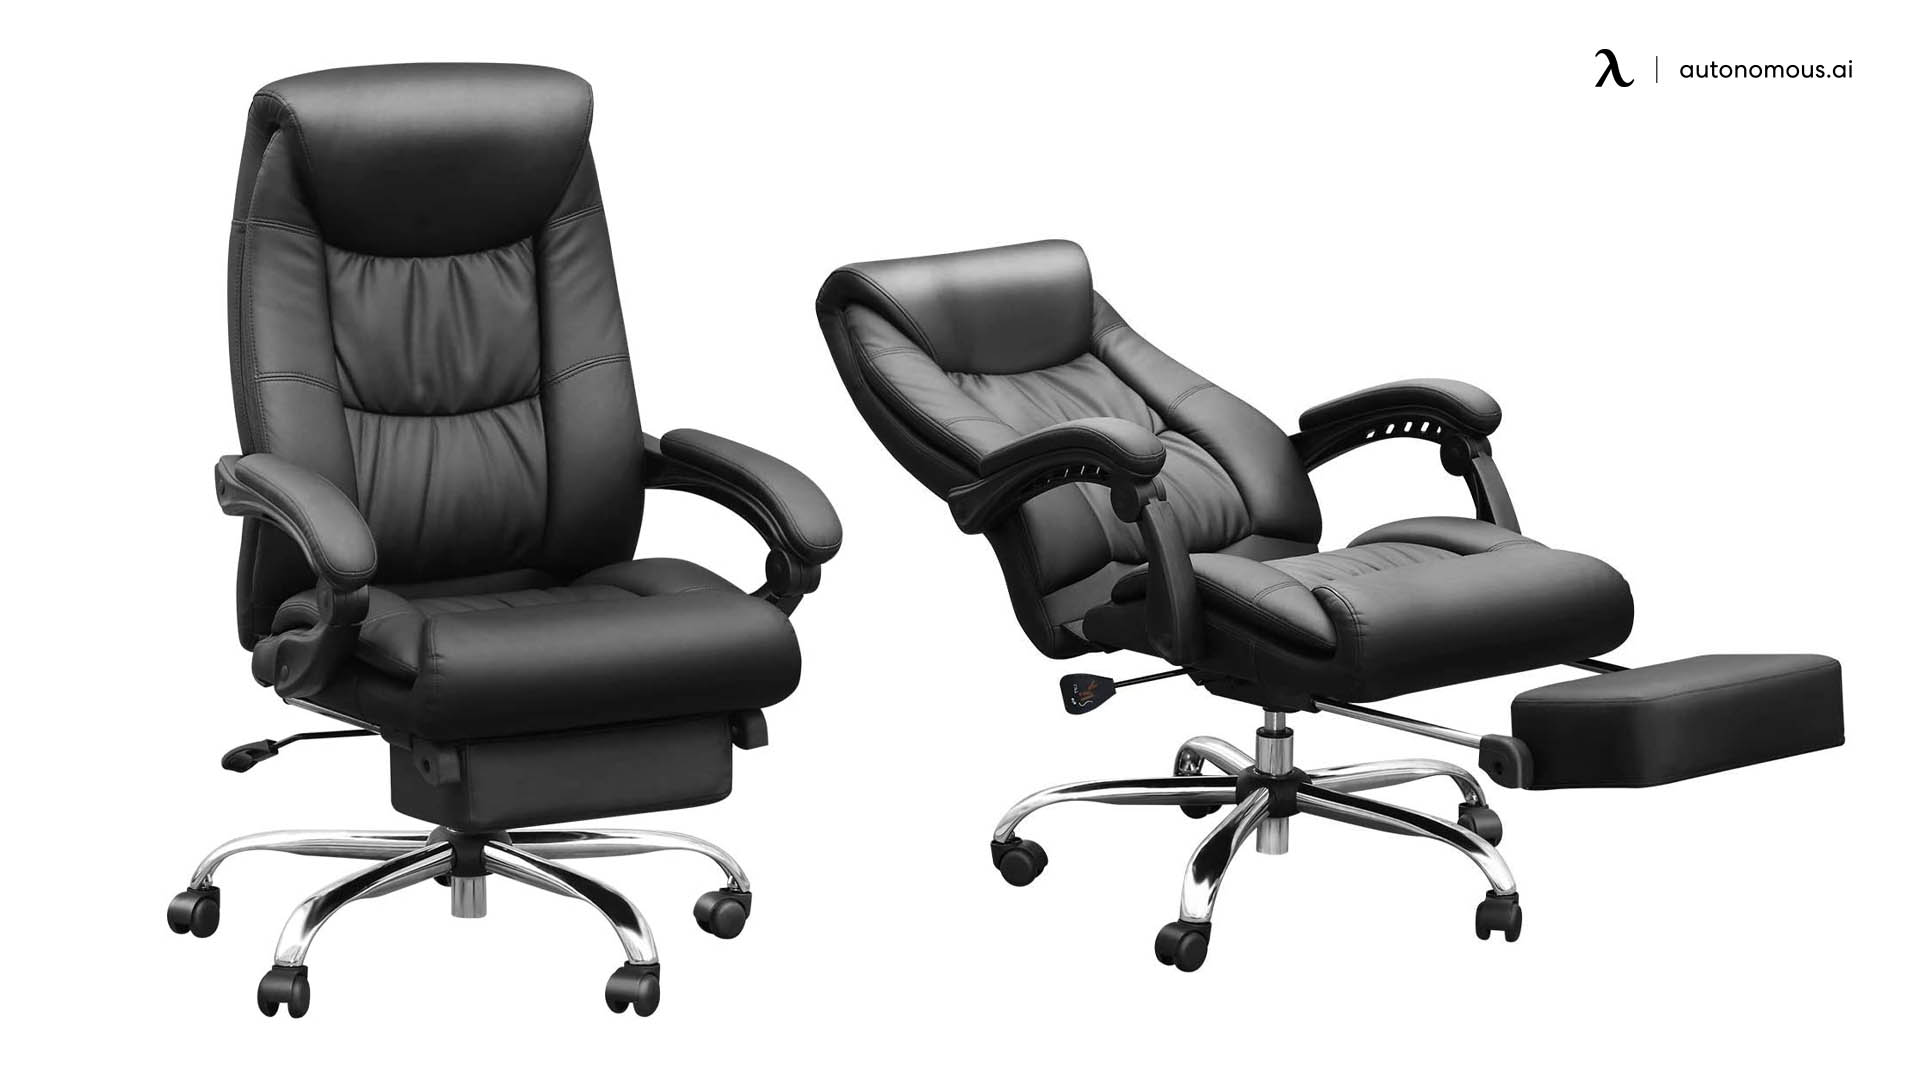 Duramount Reclining Office Chair